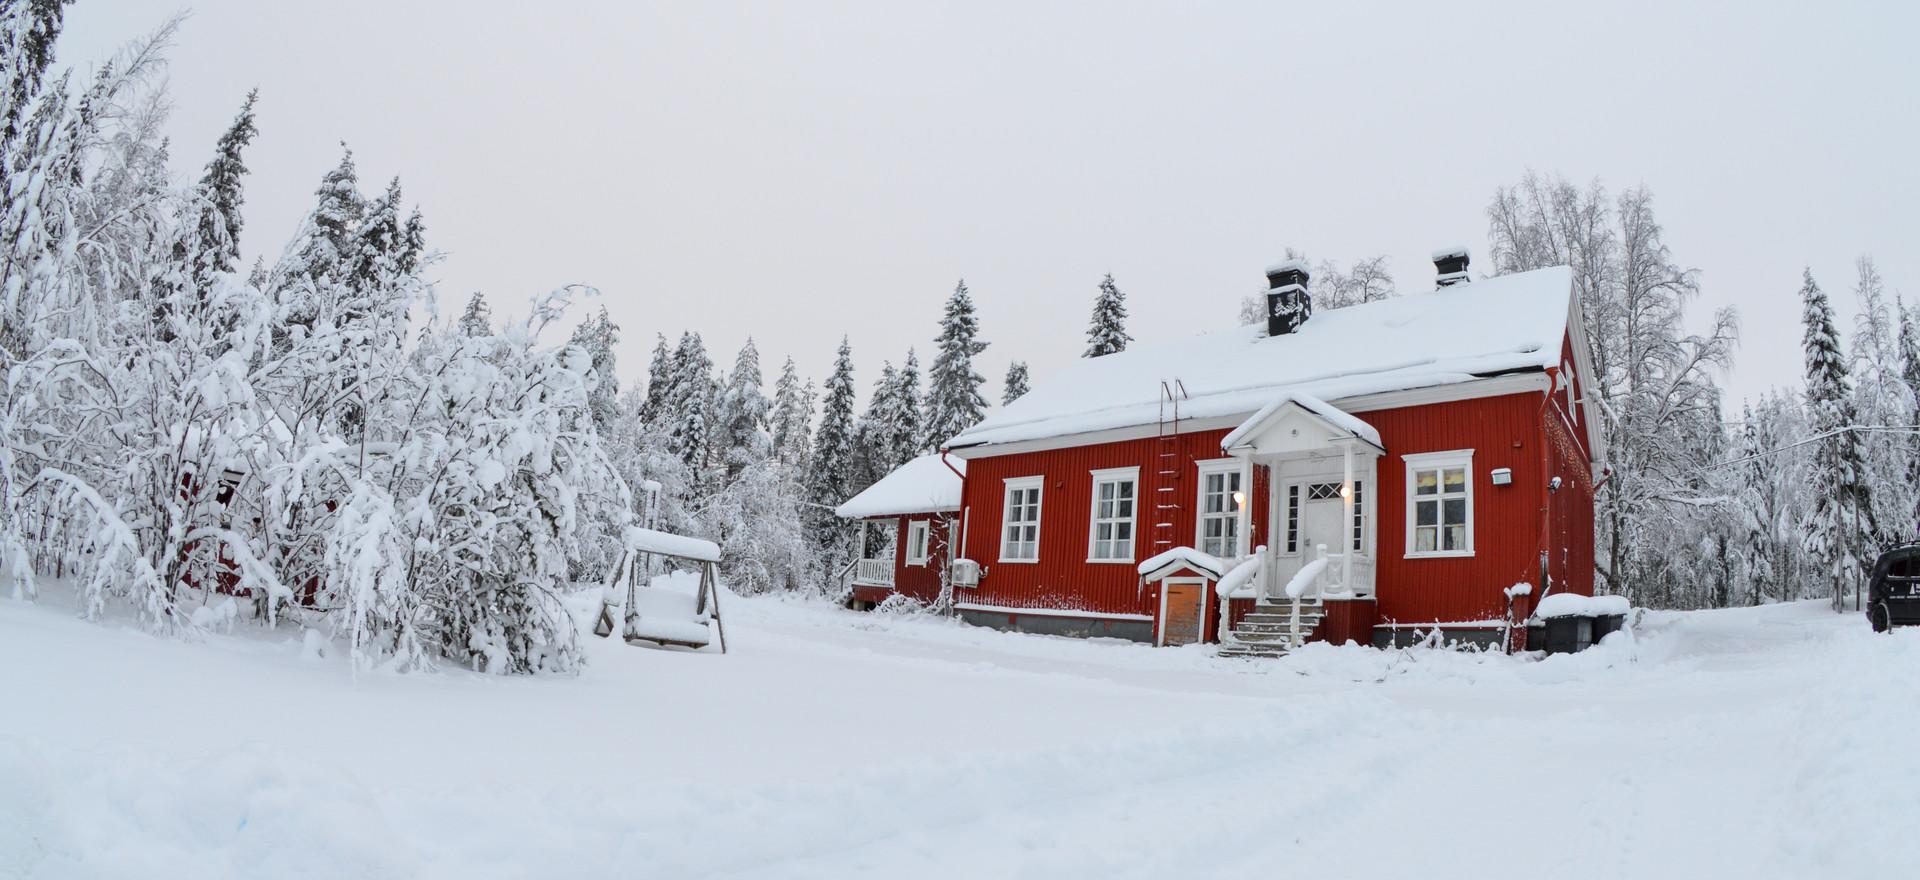 Aneen Loma Posio Lapland